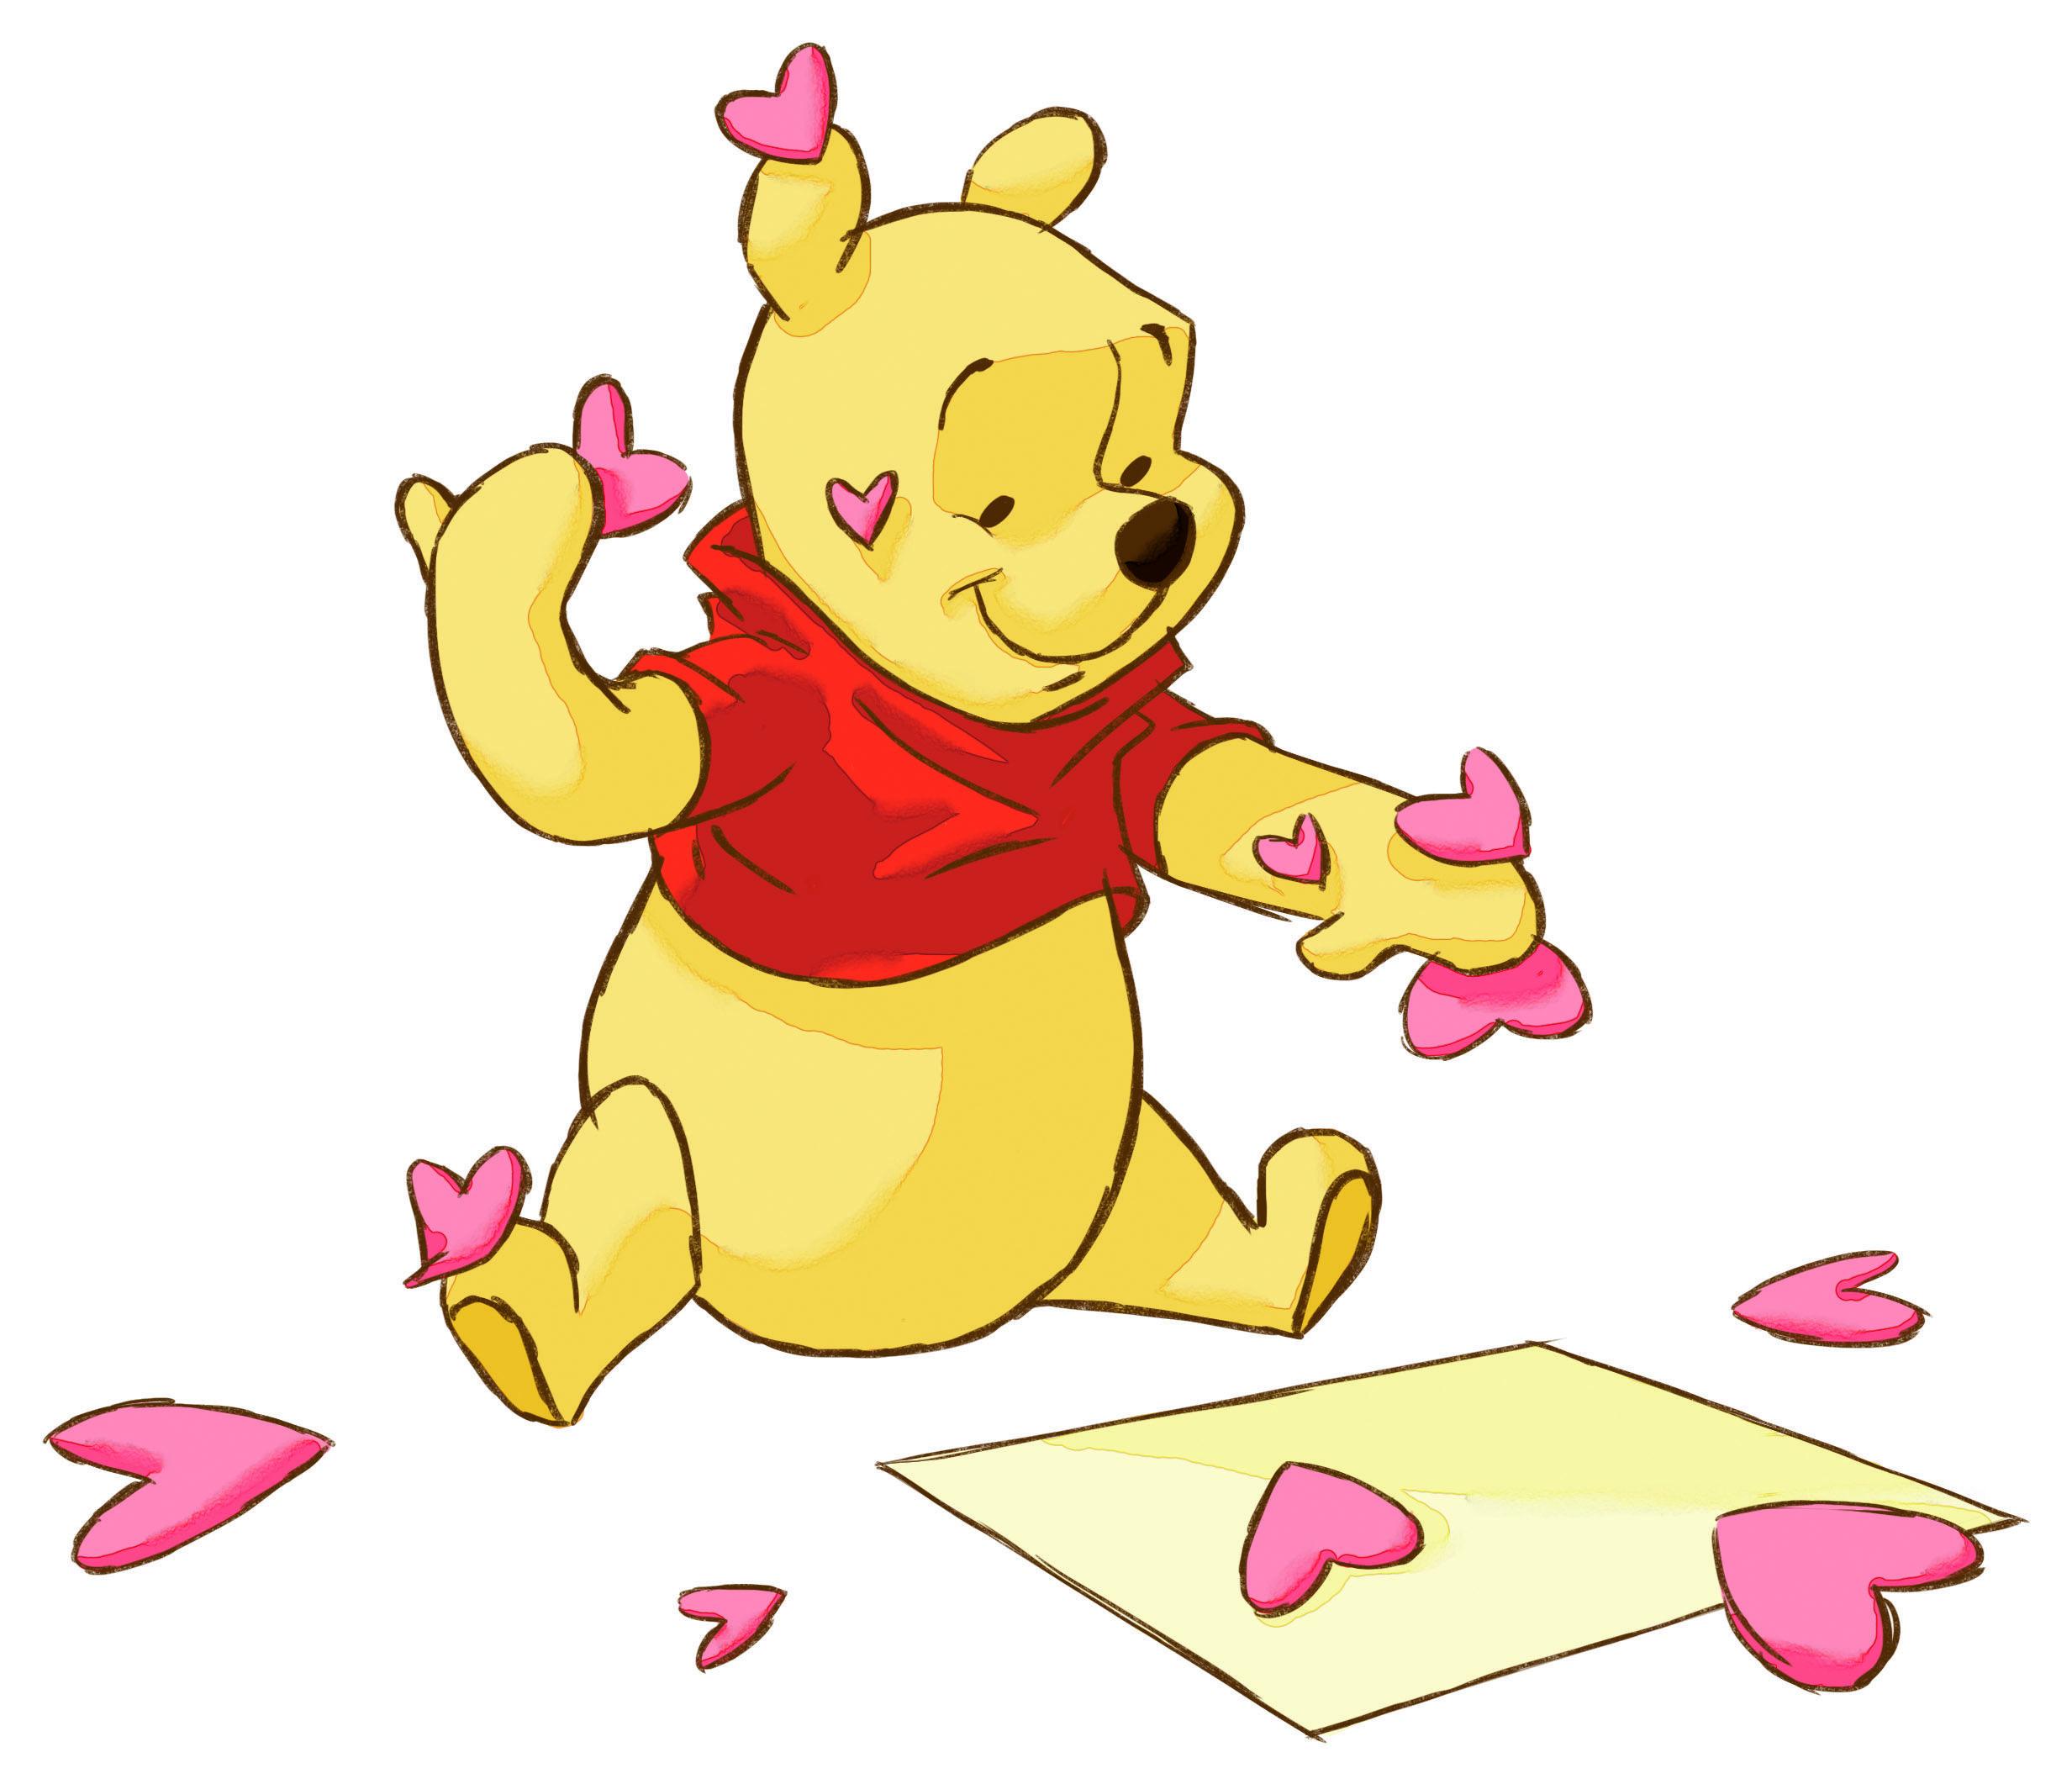 Pin de Katya Juarez en Pooh mi amor :3 | Pinterest | Amor y Frases